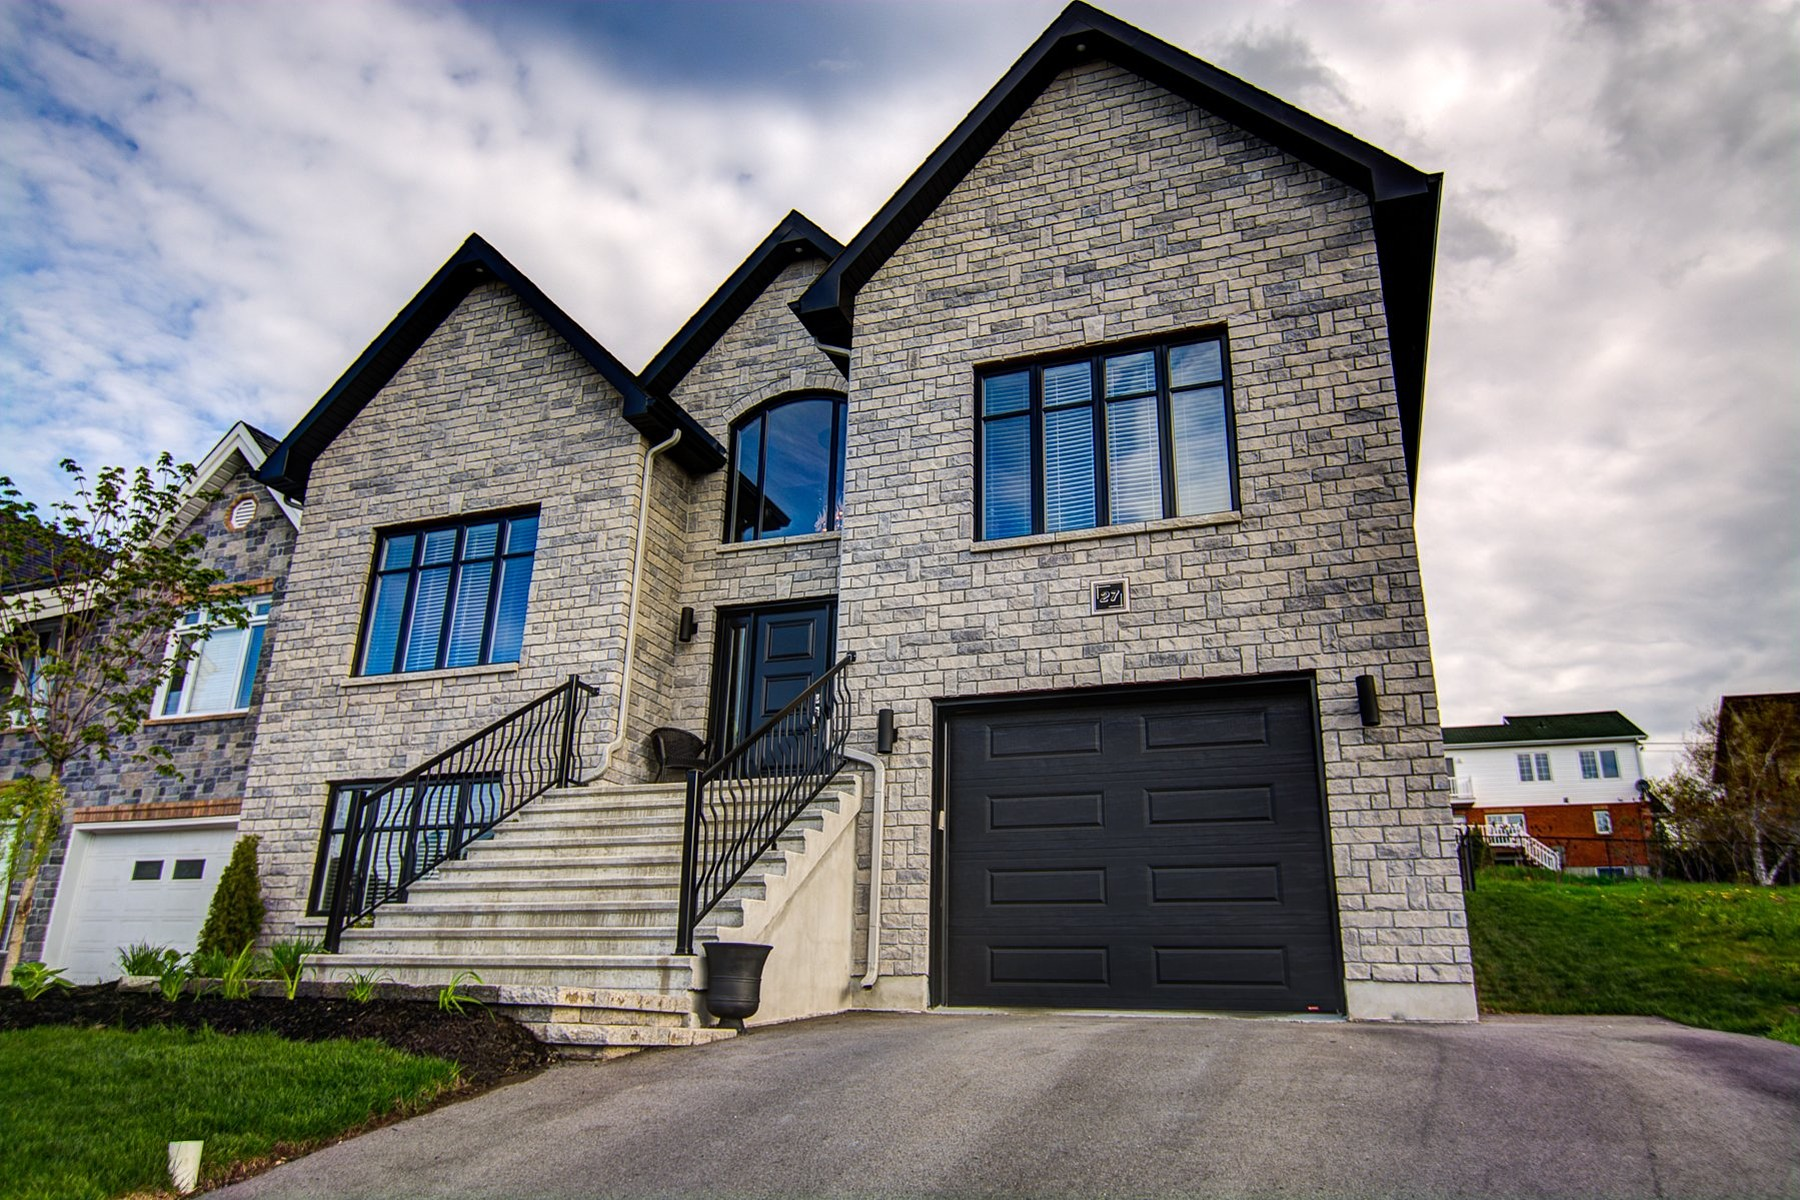 Single Family Home for Sale at Gatineau (Gatineau), Outaouais 27 Rue de St-Vallier Gatineau, Quebec, J8V3V5 Canada